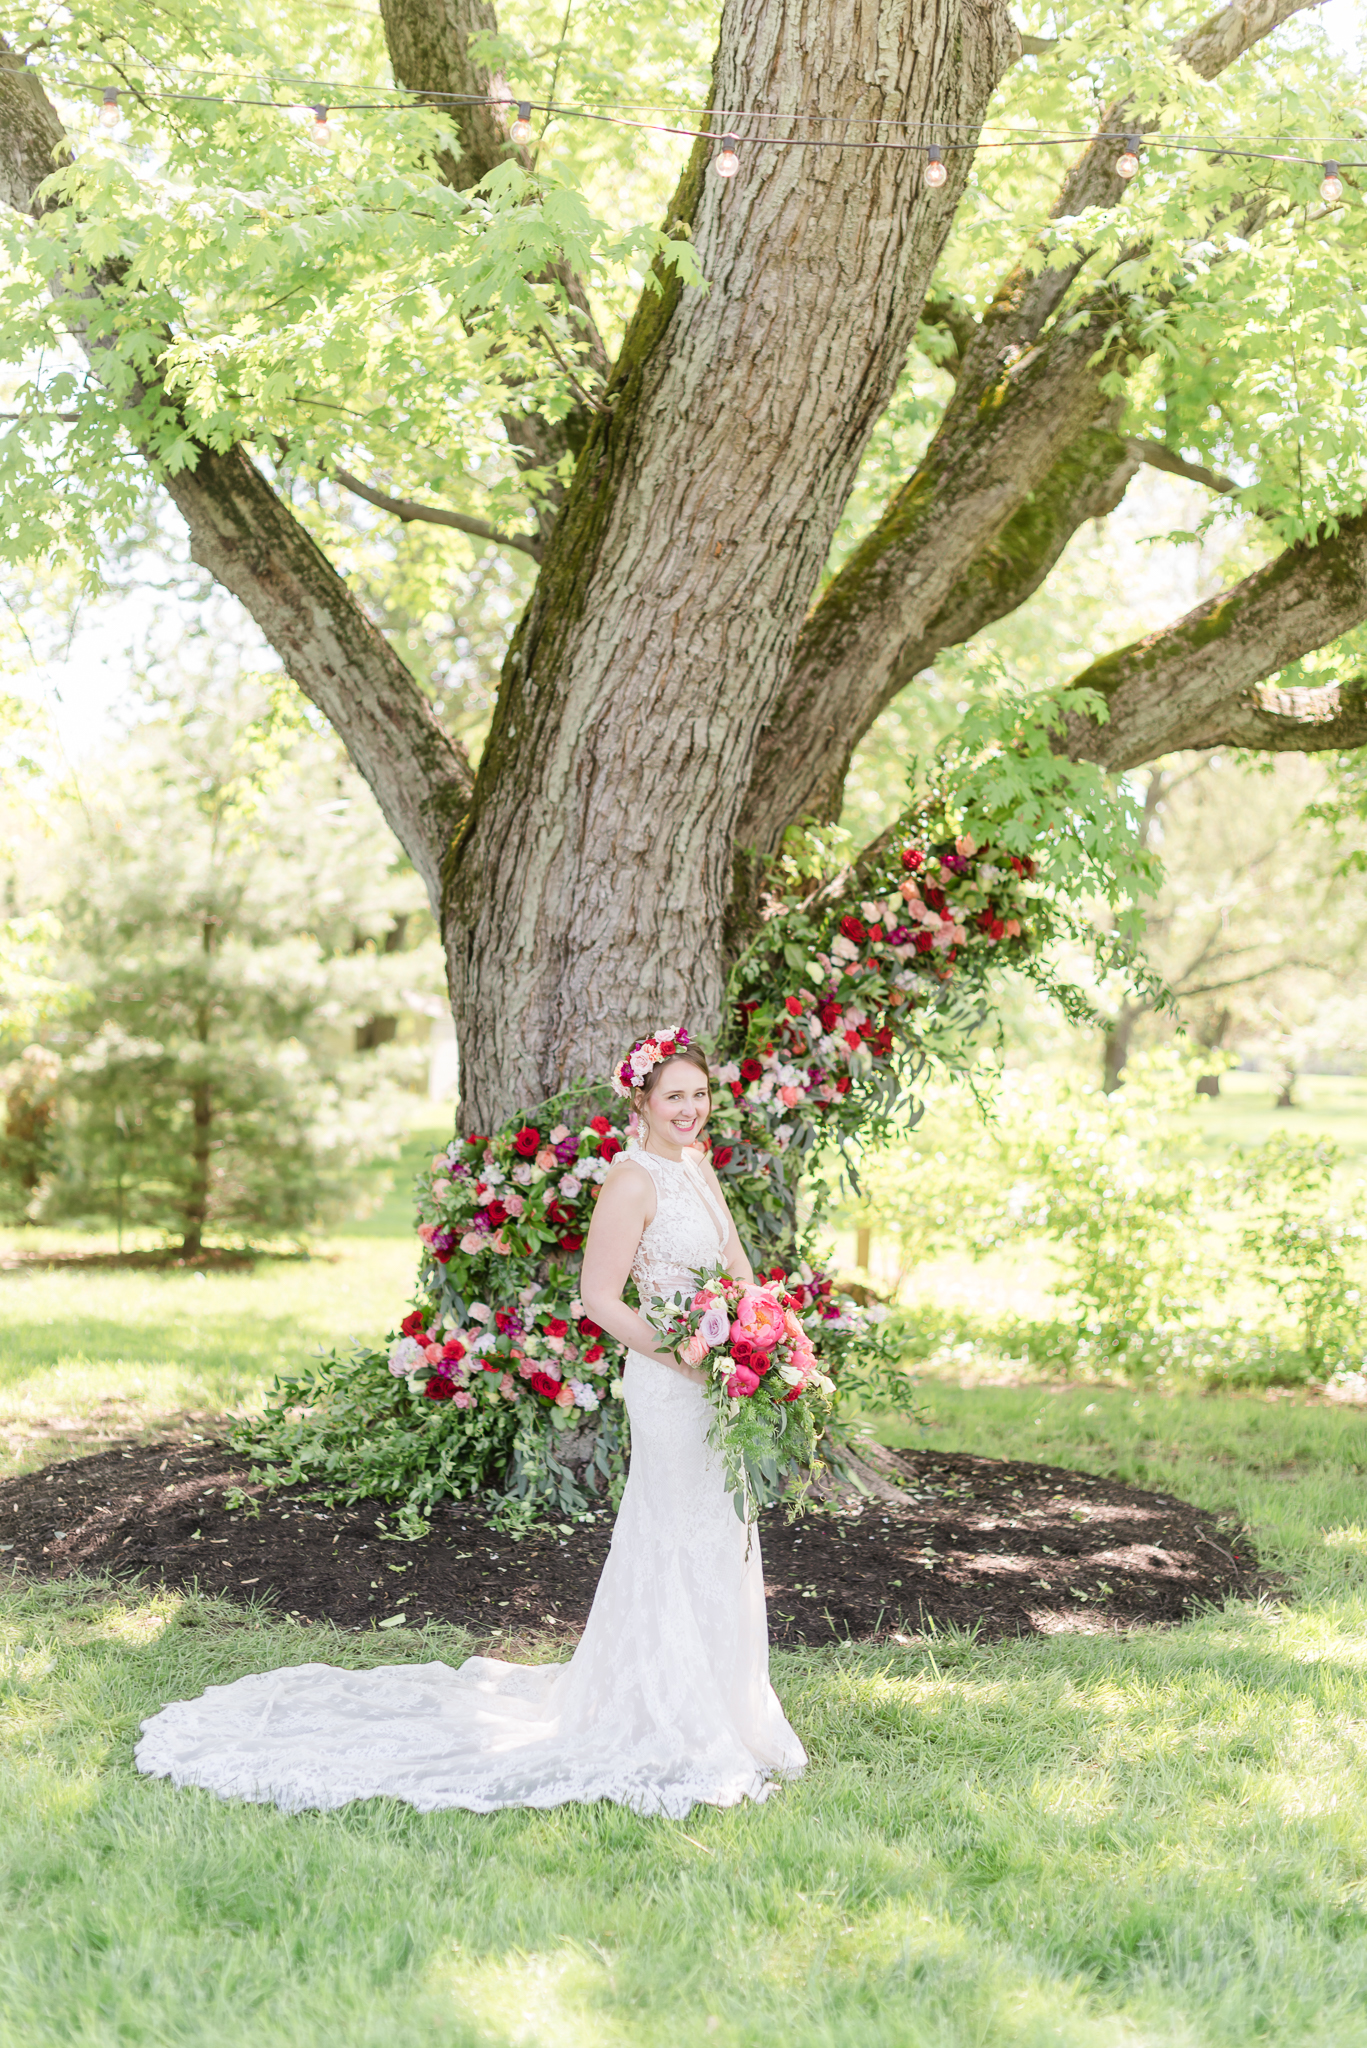 Mustard Seed Gardens Wedding Indianapolis Noblesvile Fishers Wedding Photographer-44.jpg